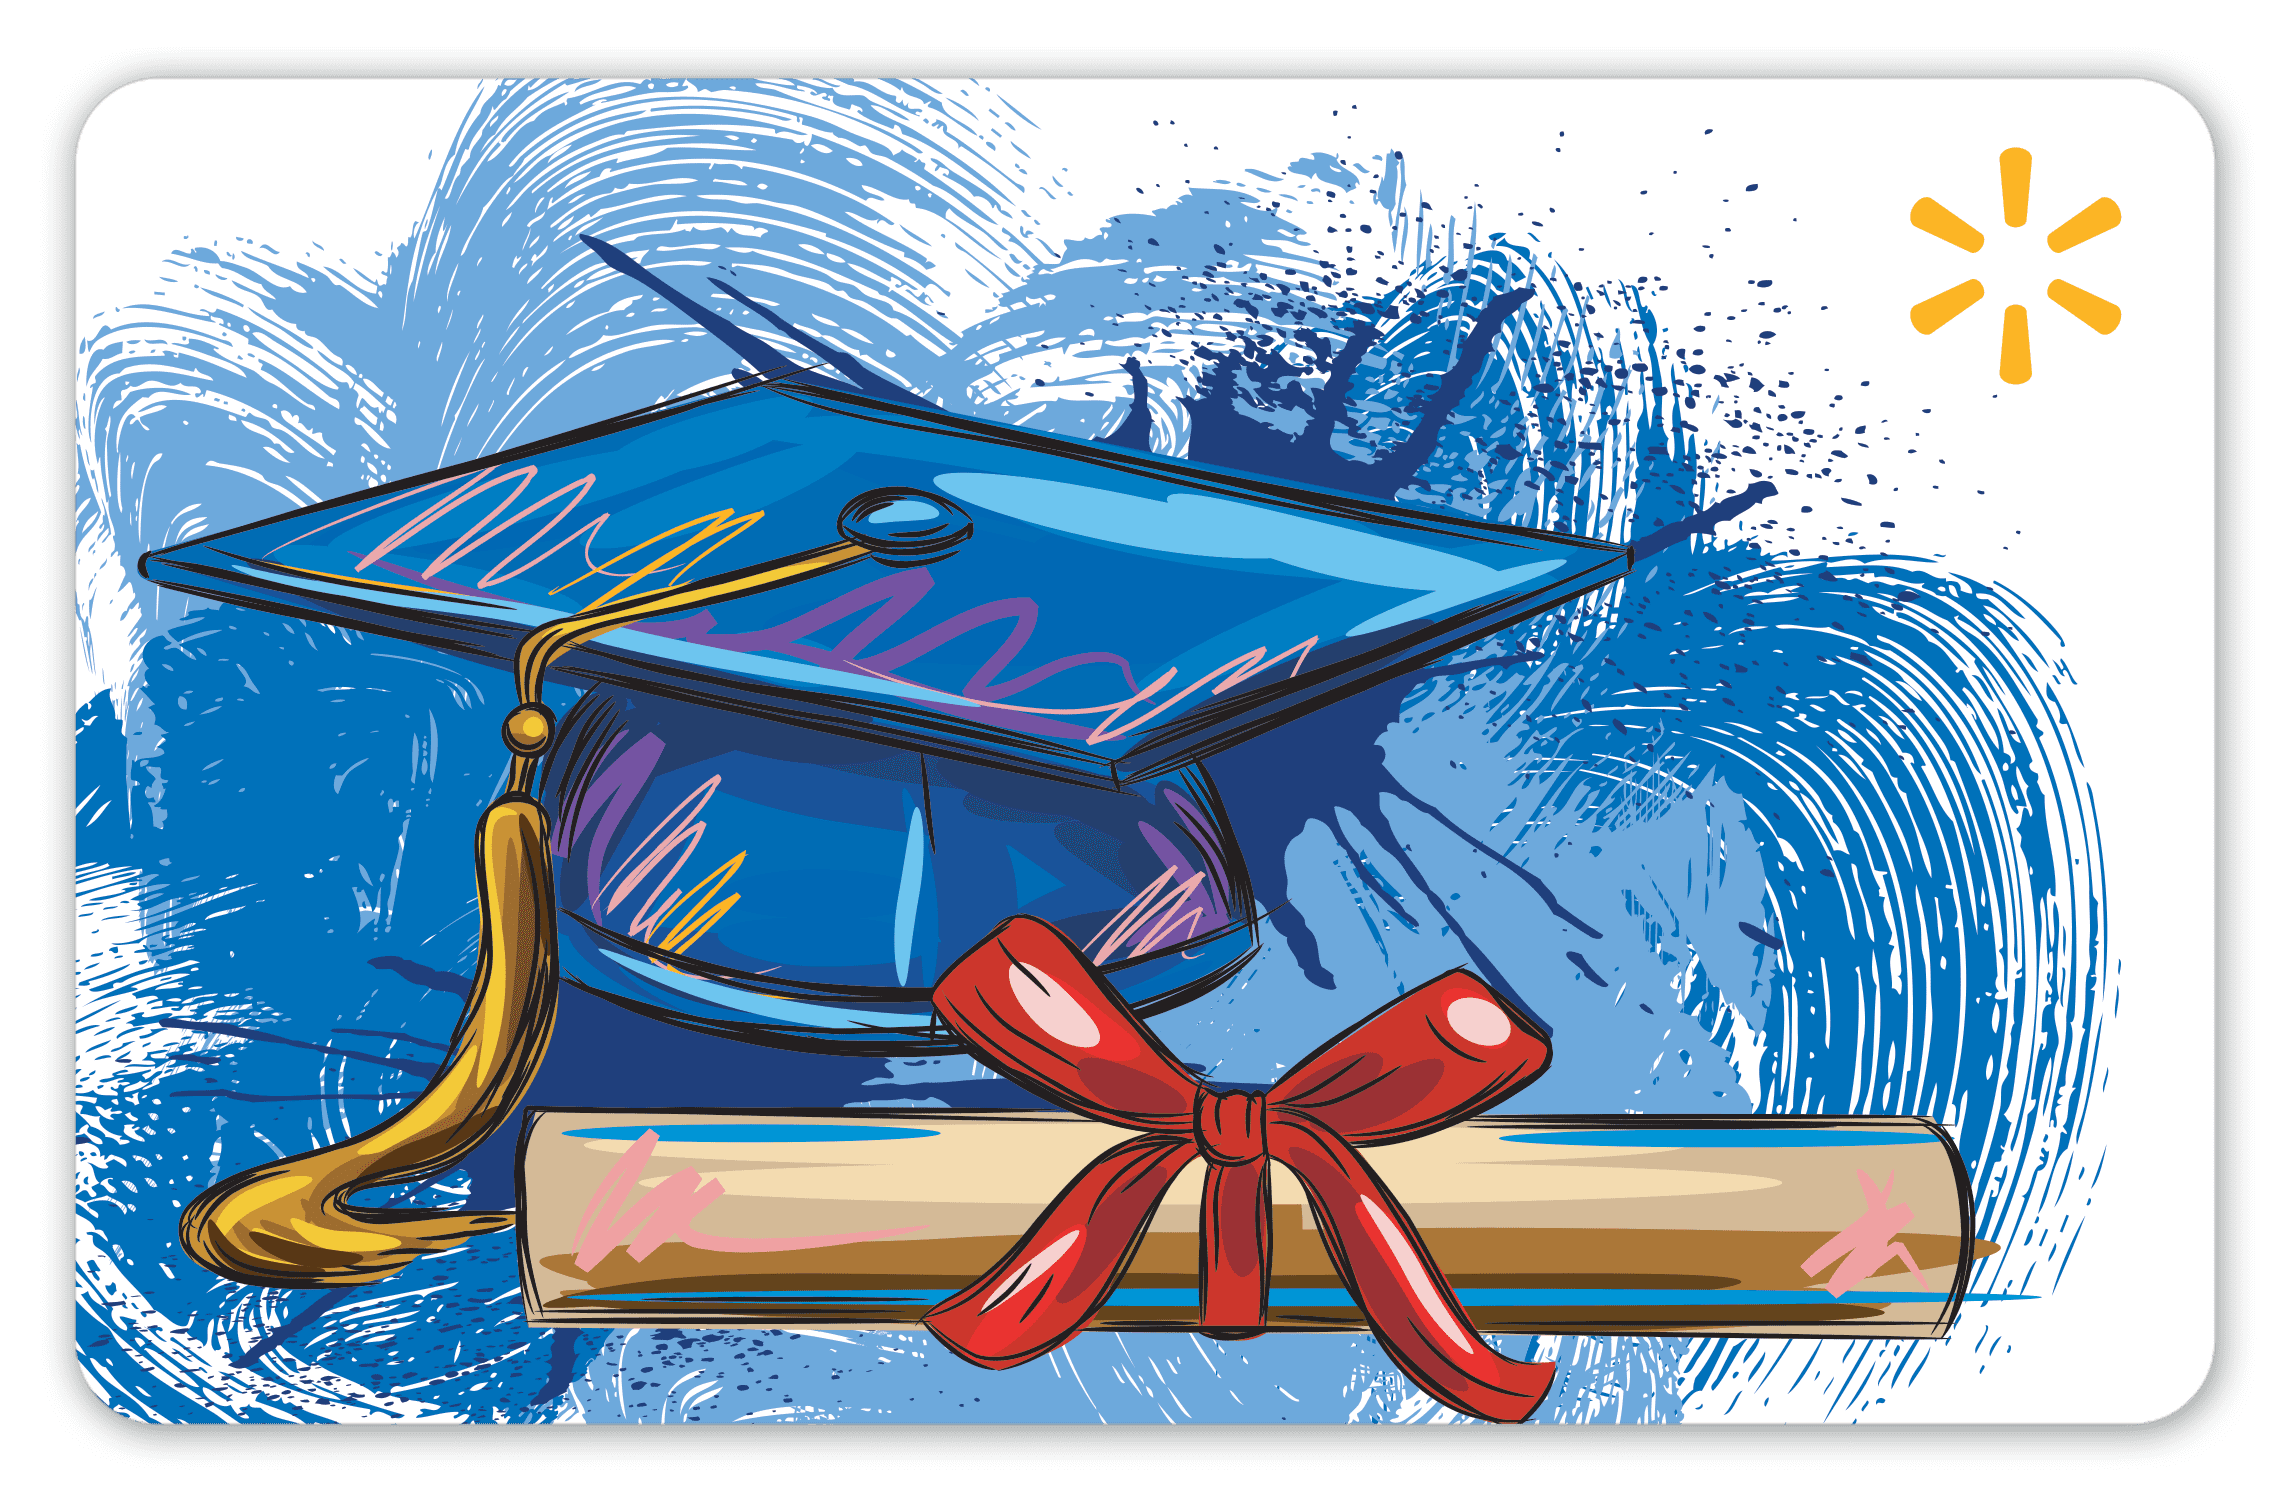 Graduation Walmart Gift Card - Walmart.com - Walmart.com